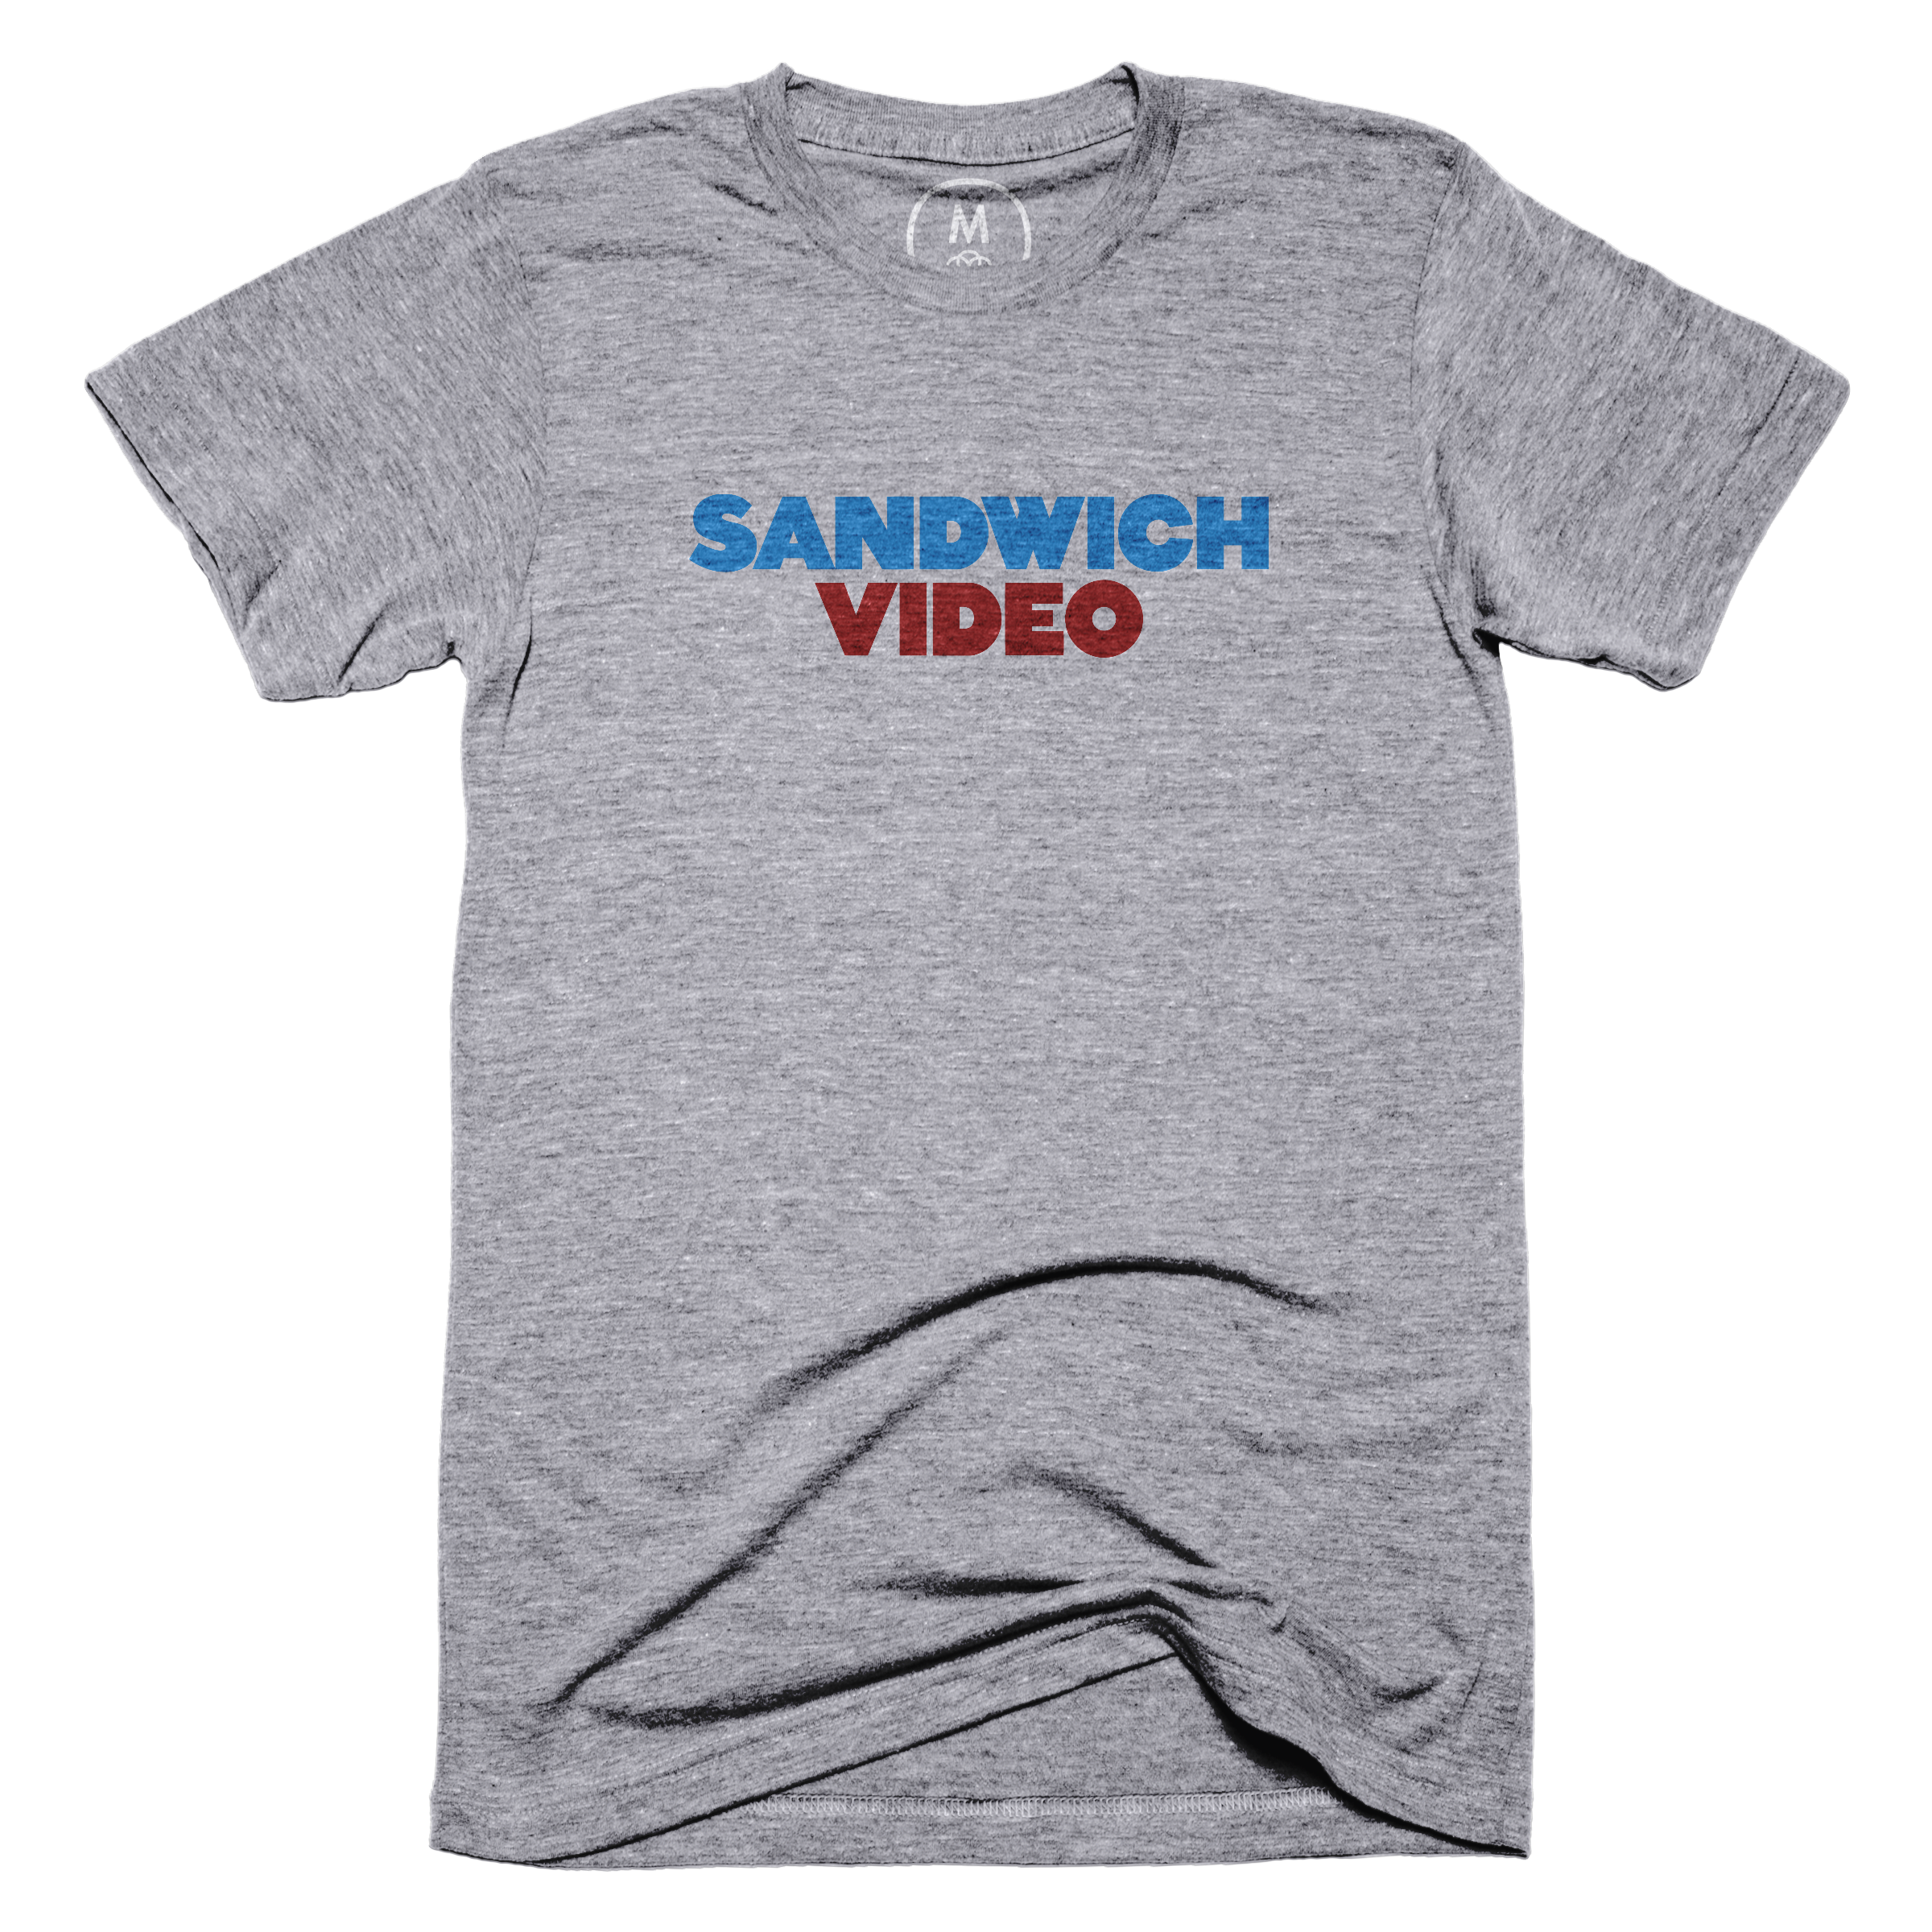 "Sandwich Video ""The Classic"" Premium Heather (Men's)"